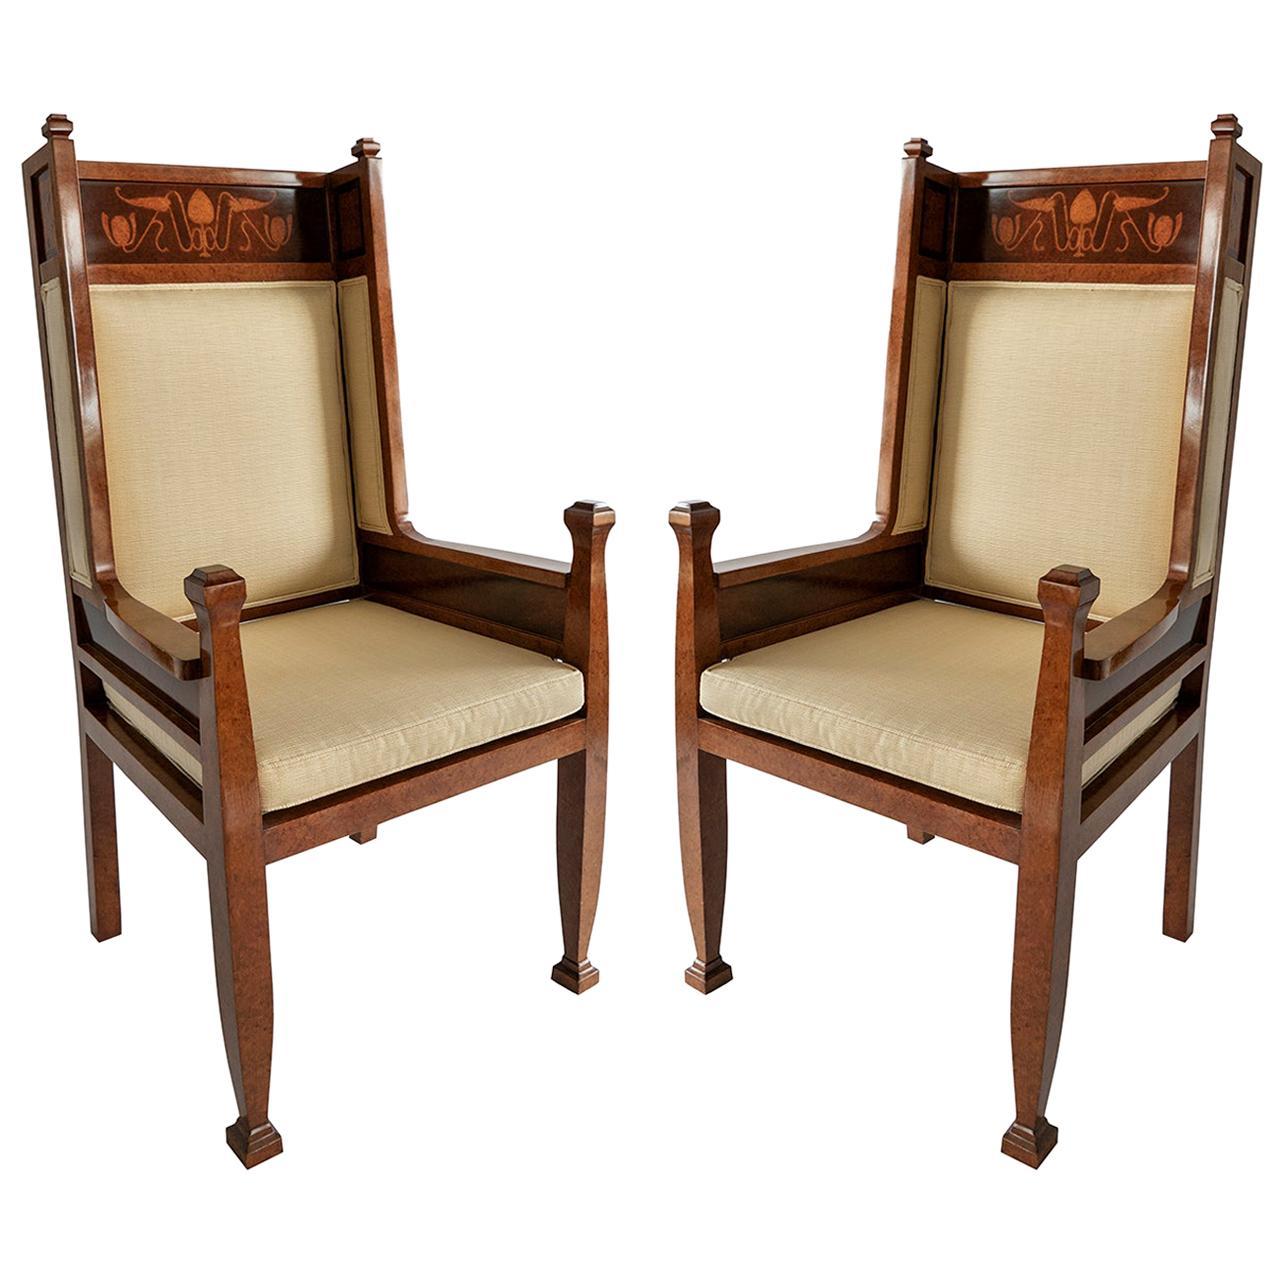 Pair Swedish Art Deco Inlaid High Back Armchairs, Carl Malmsten